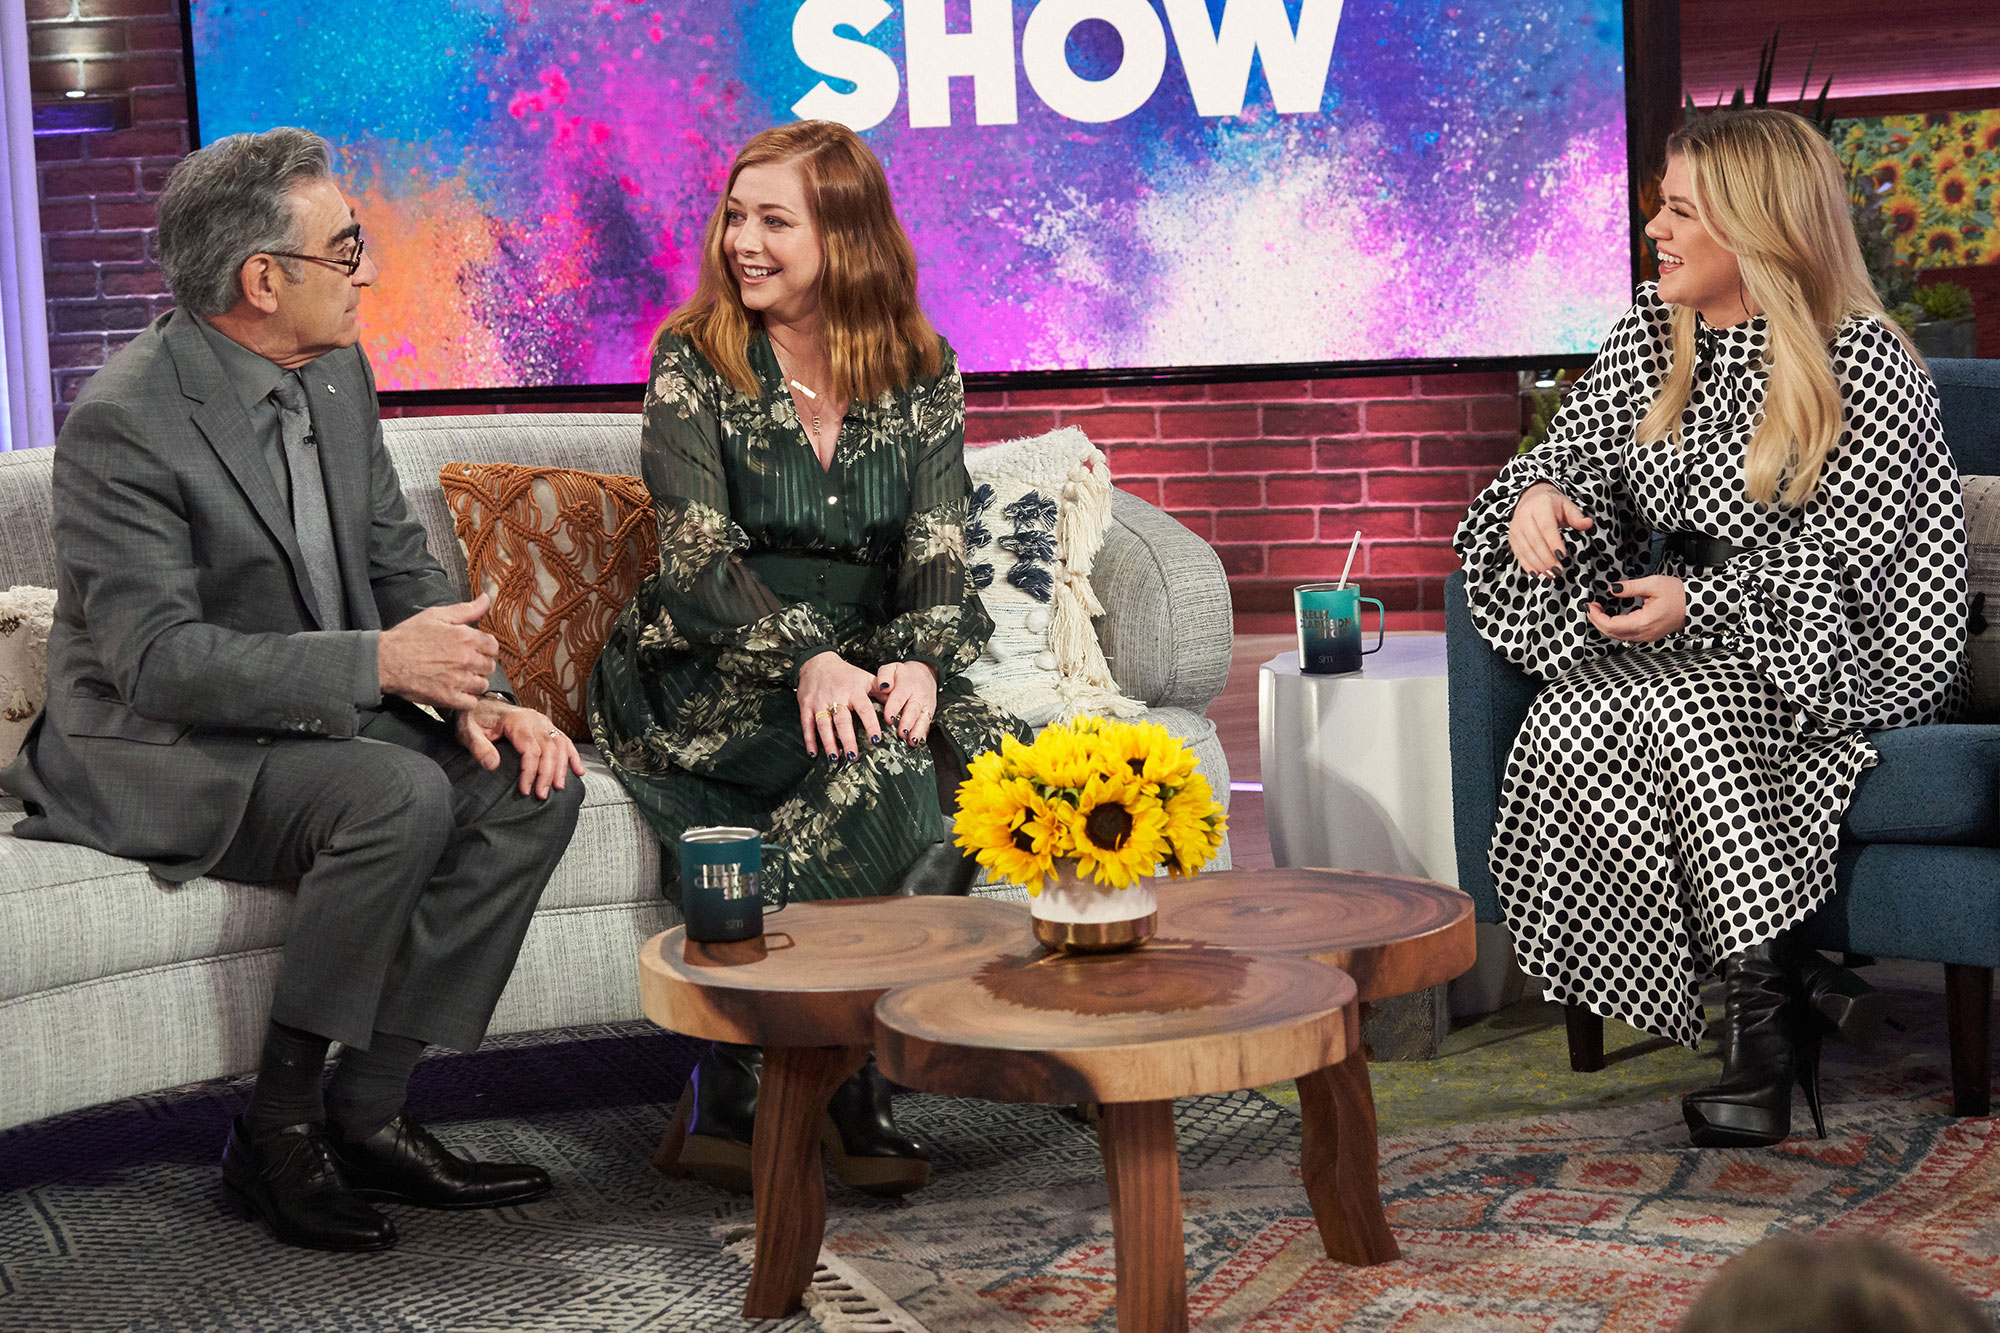 Eugene Levy, Alyson Hannigan, Kelly Clarkson